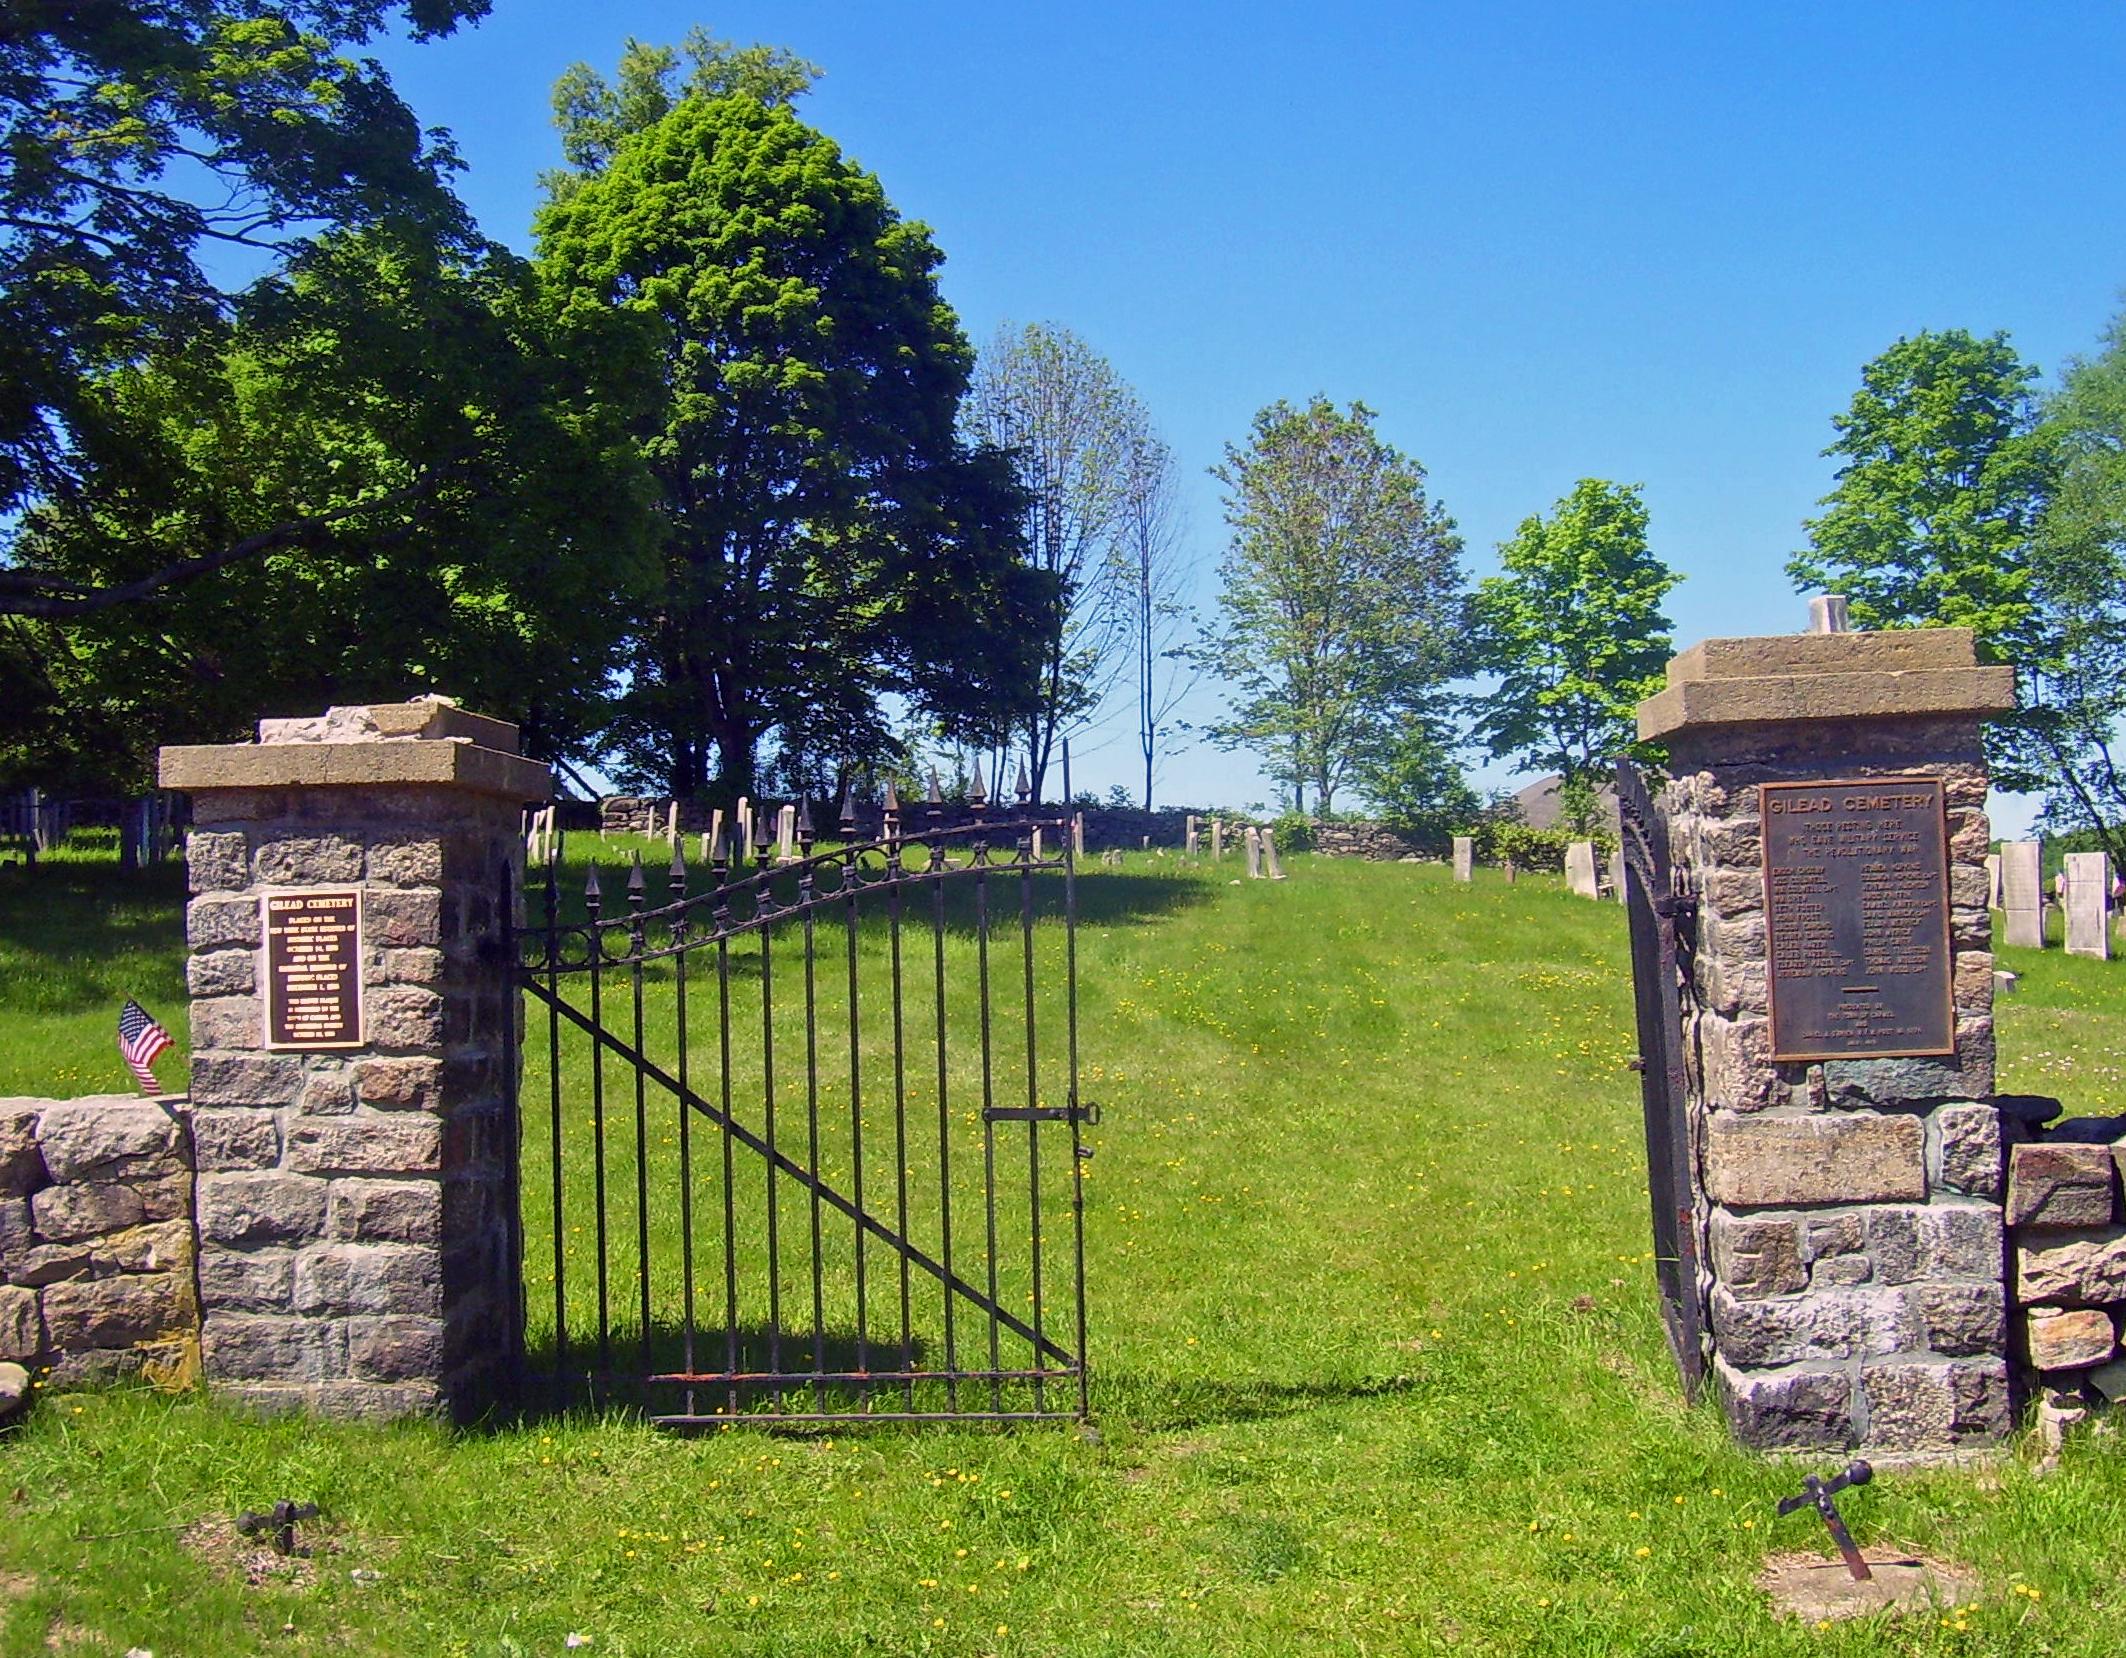 Gilead Cemetery Carmel Hamlet Roadtrippers